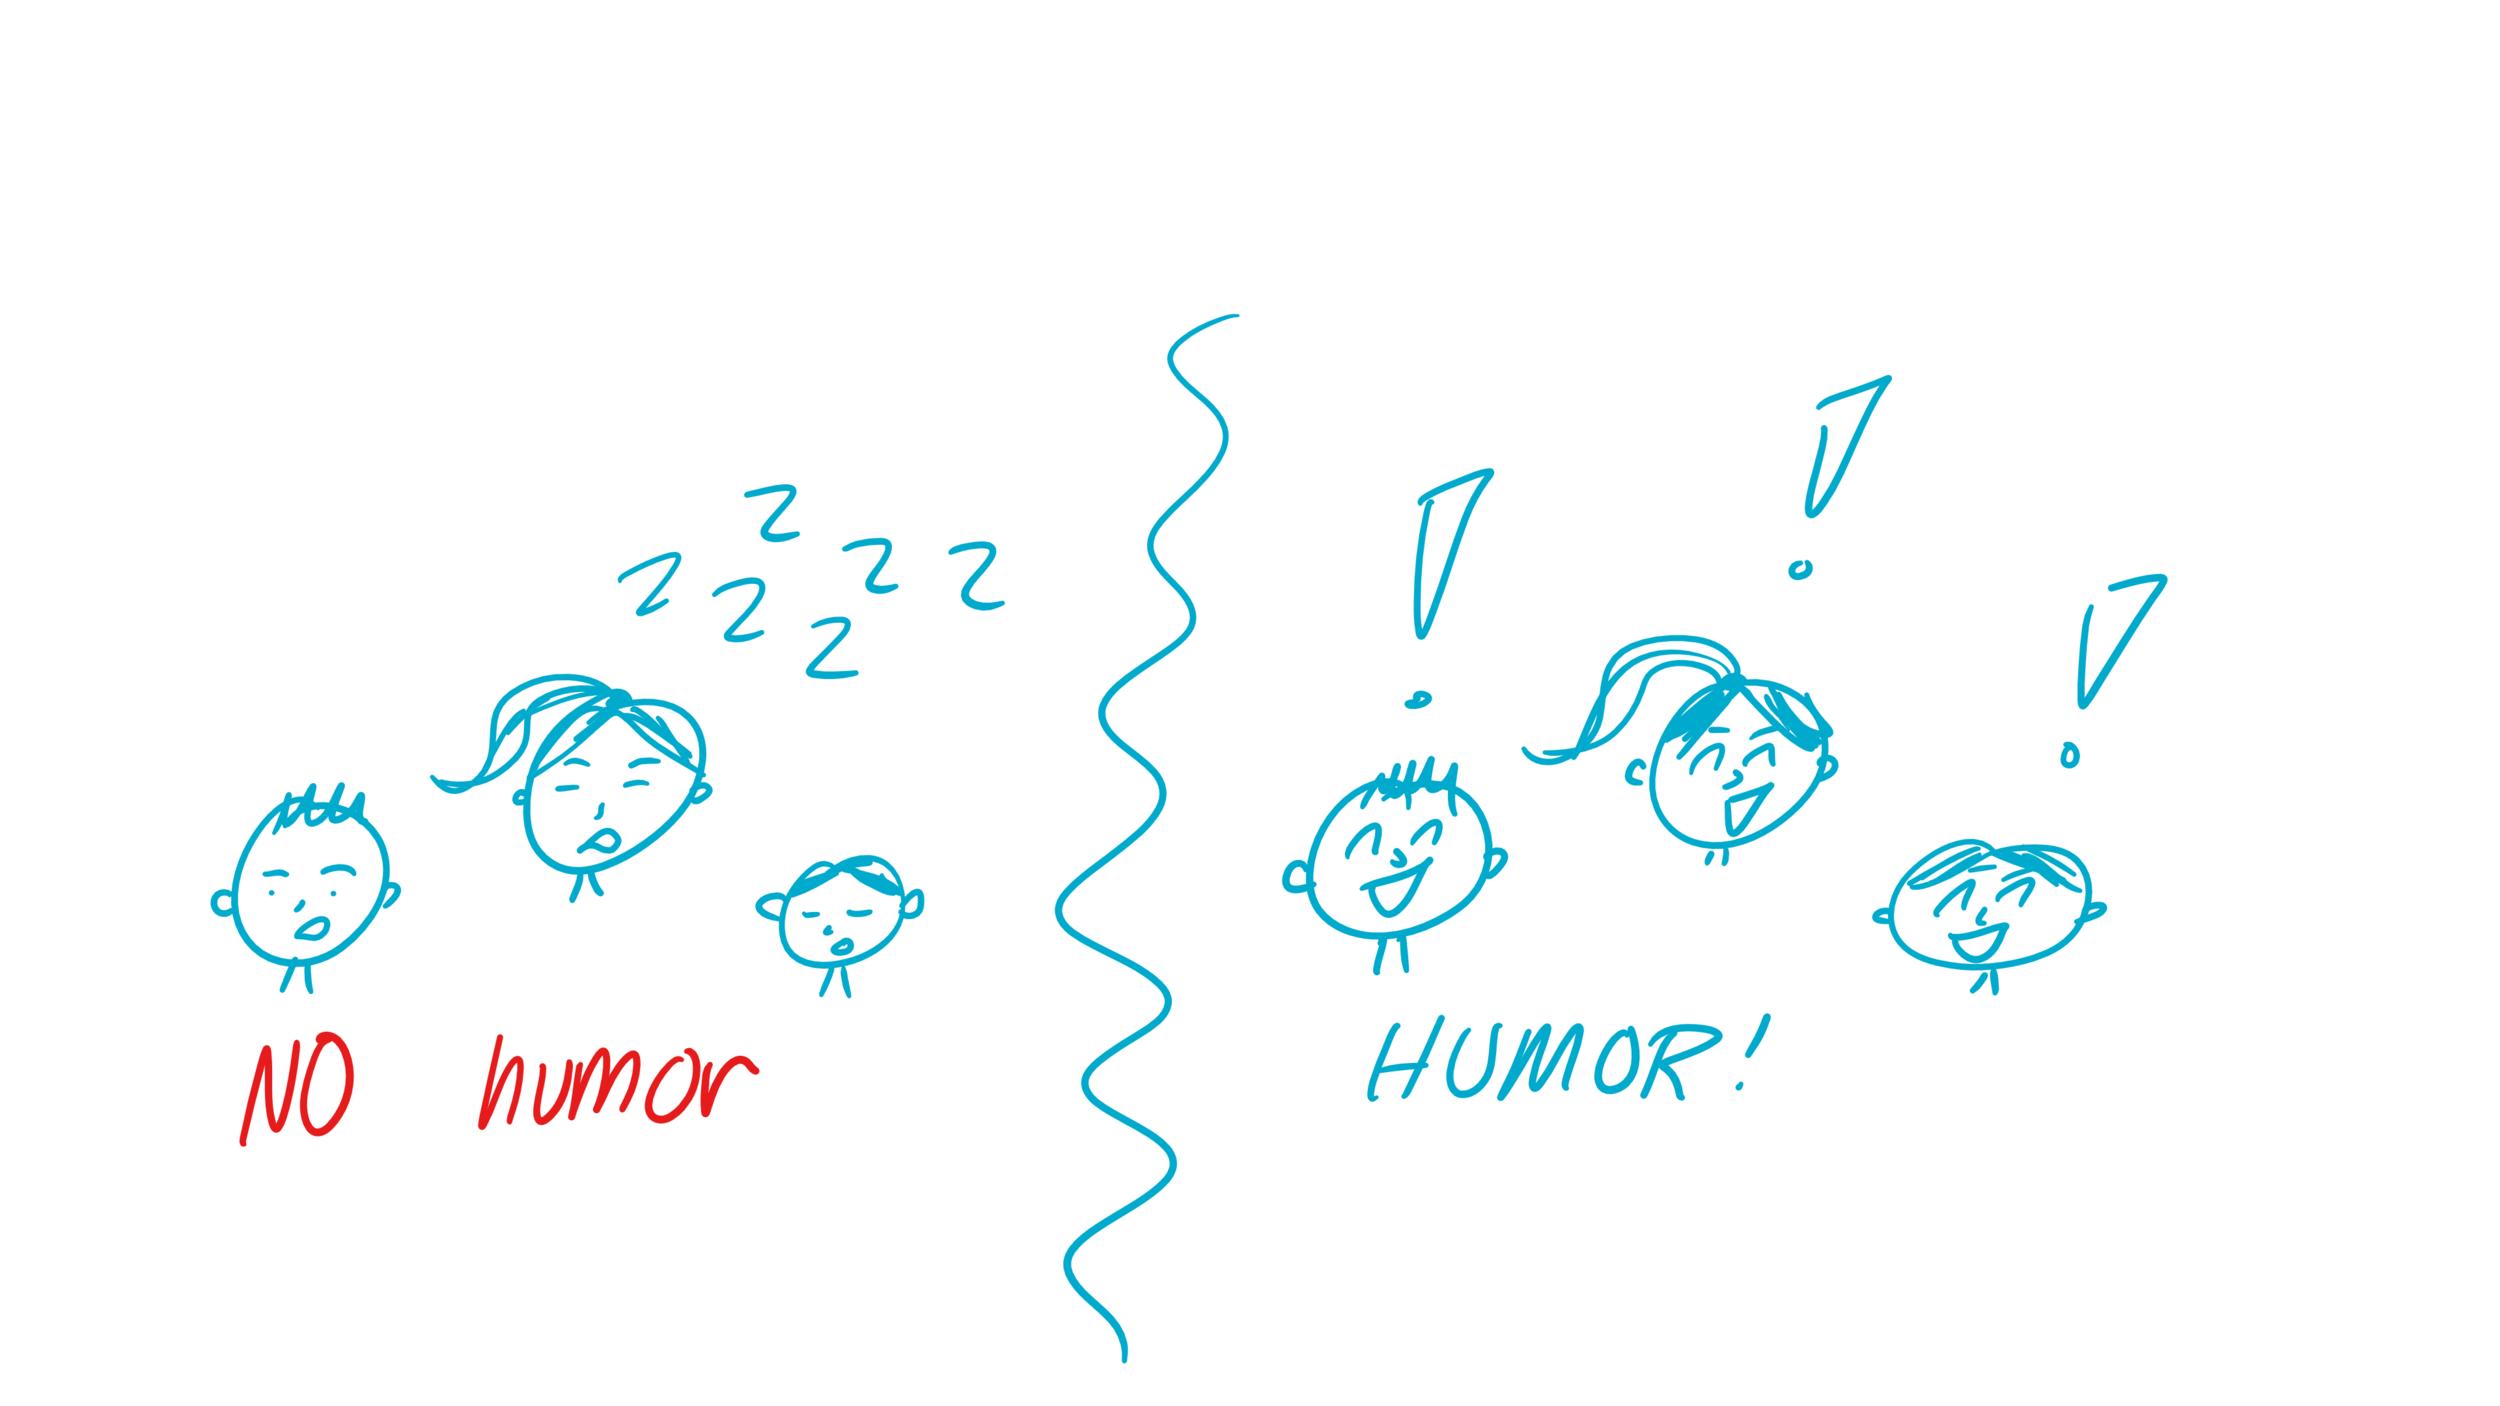 Using-Humor-EchoRivera-academic-scientific-presentation-powerpoint-lecture004.png